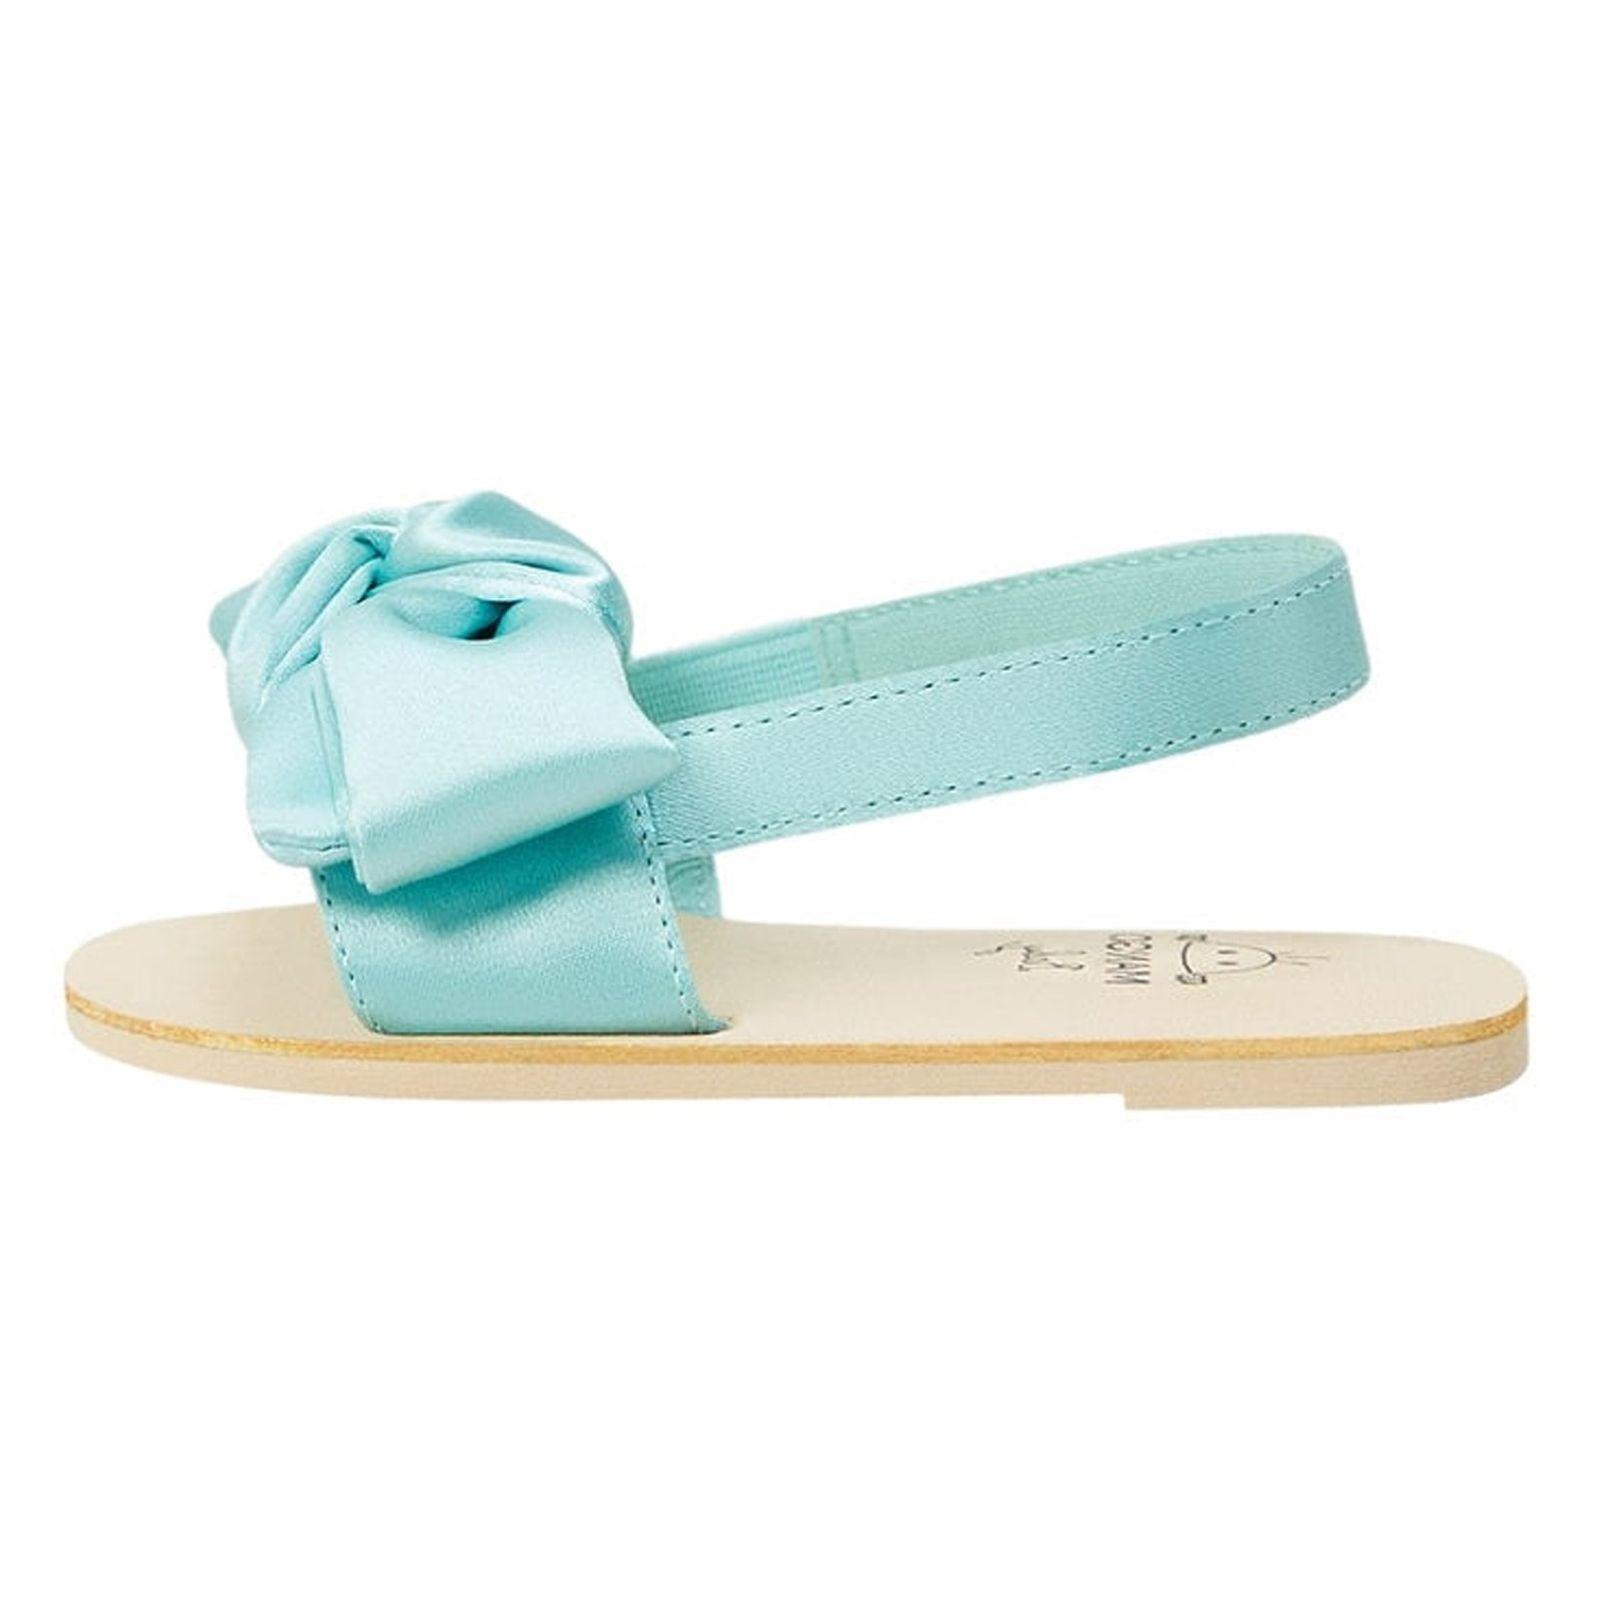 کفش بندی نوزادی دخترانه - مانگو - آبي روشن  - 2